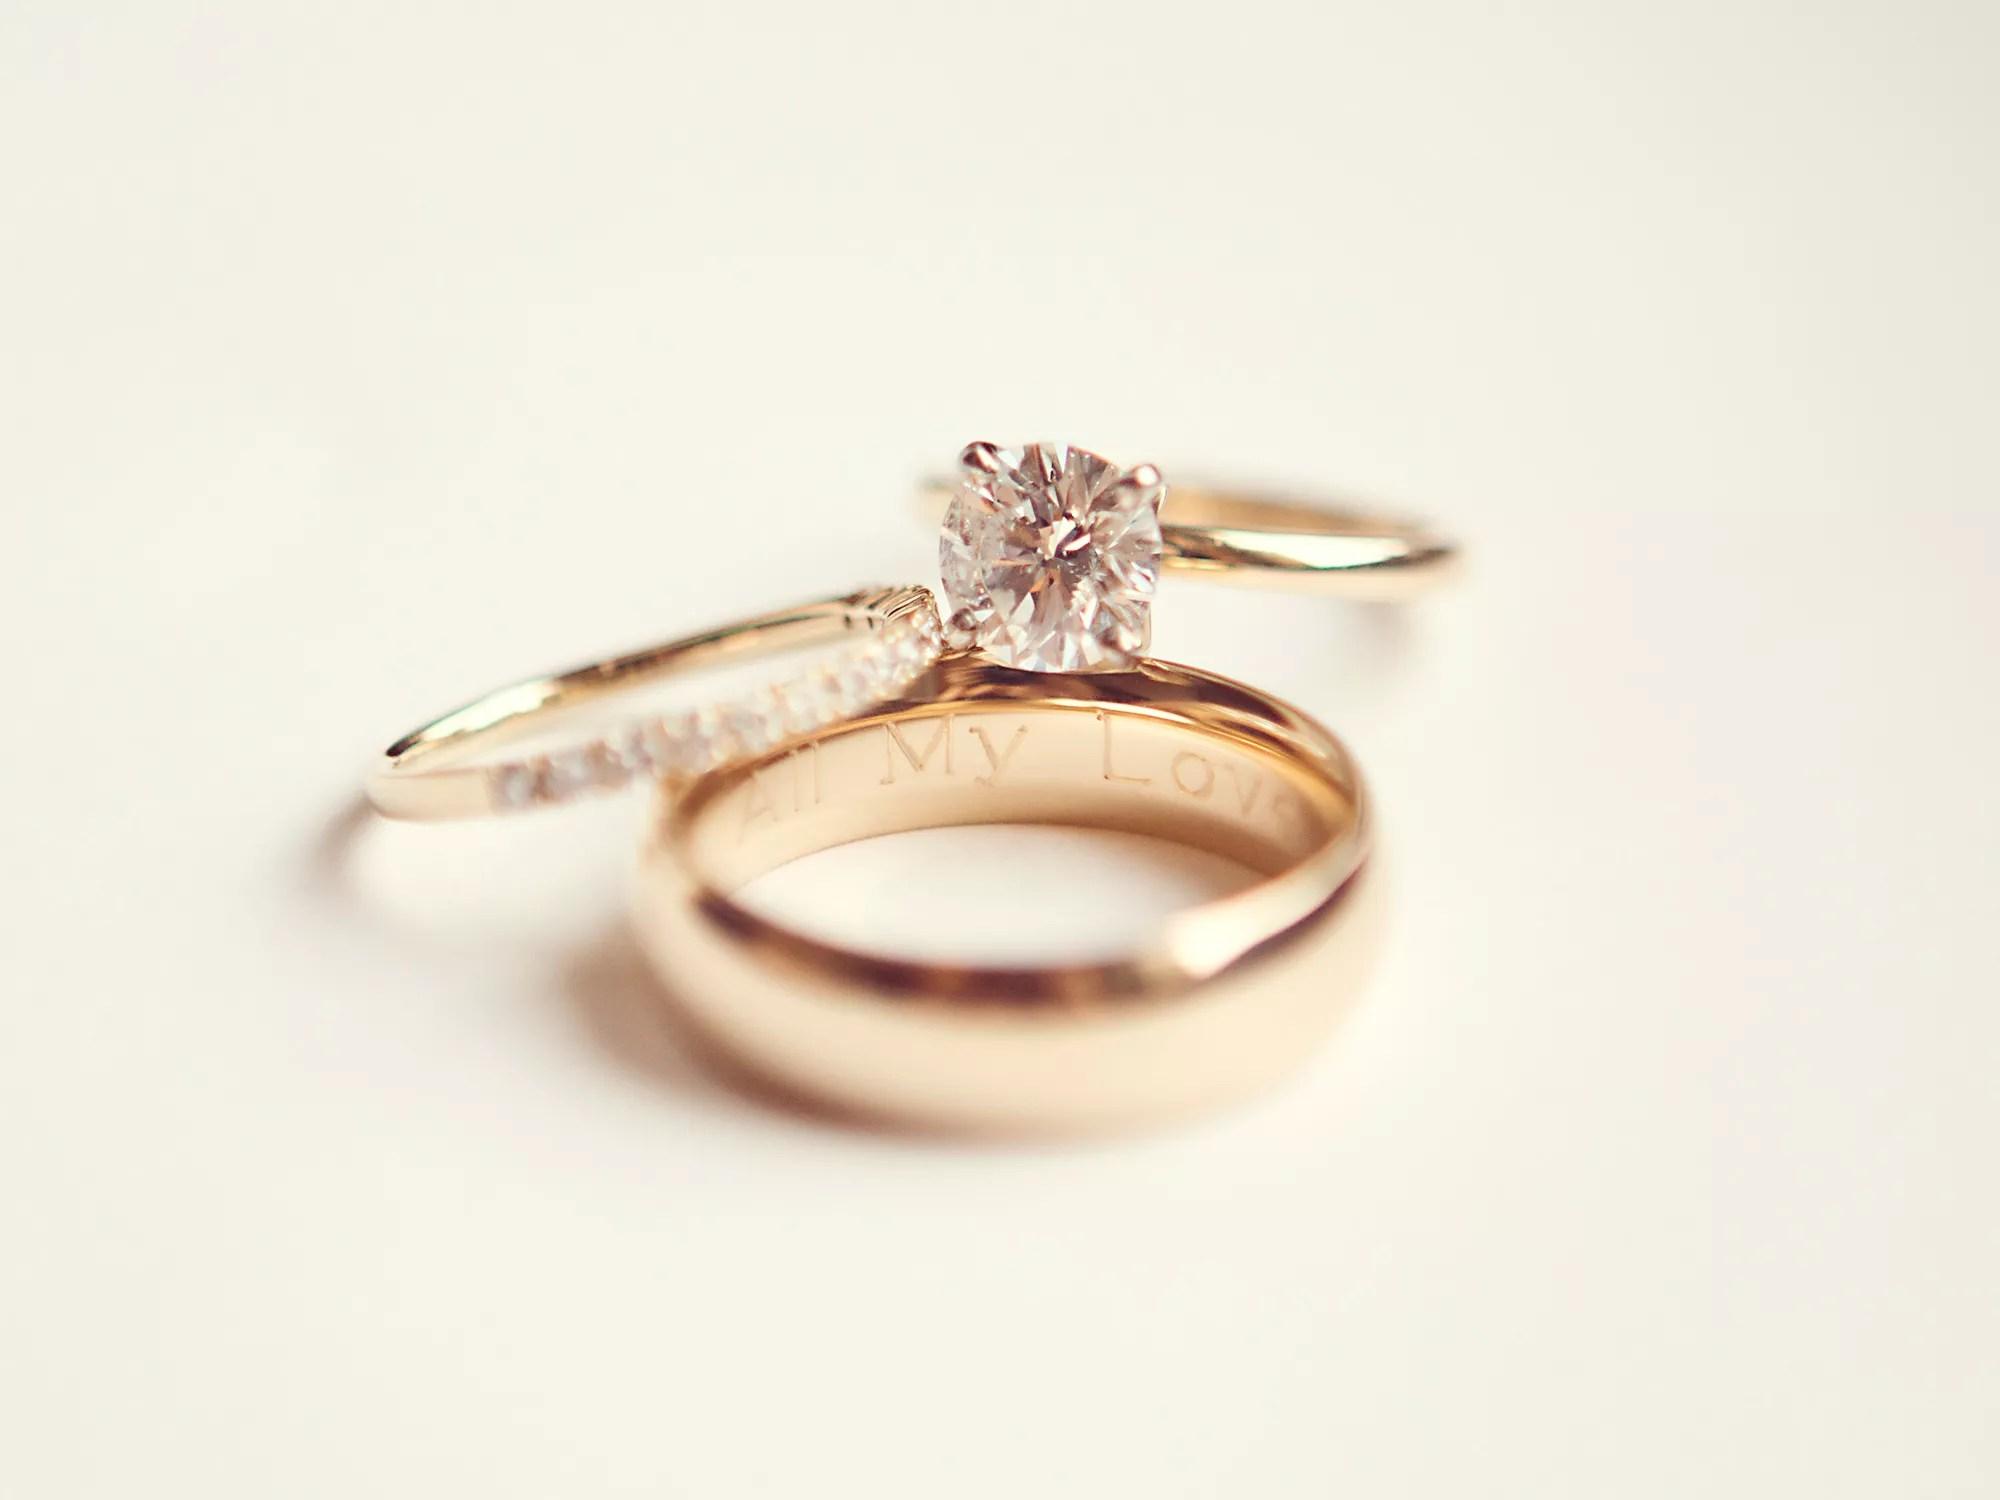 wedding rings engraving ideas tips wedding ring ideas